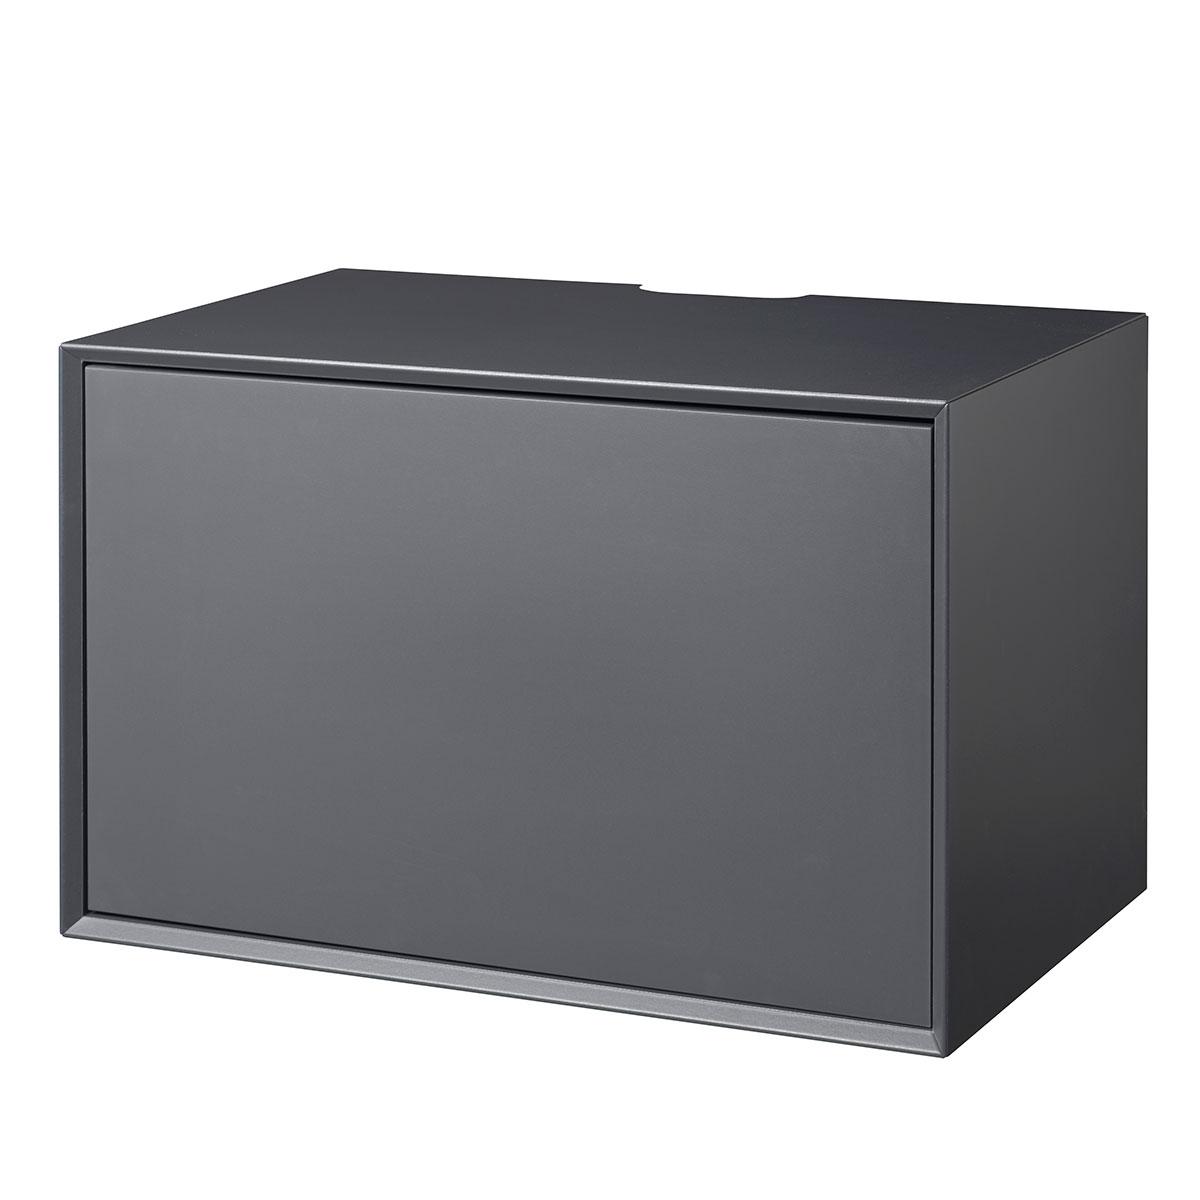 Image of   Living&more hi-fi skab - The Box - 37 x 58 x 34 cm - Antracit